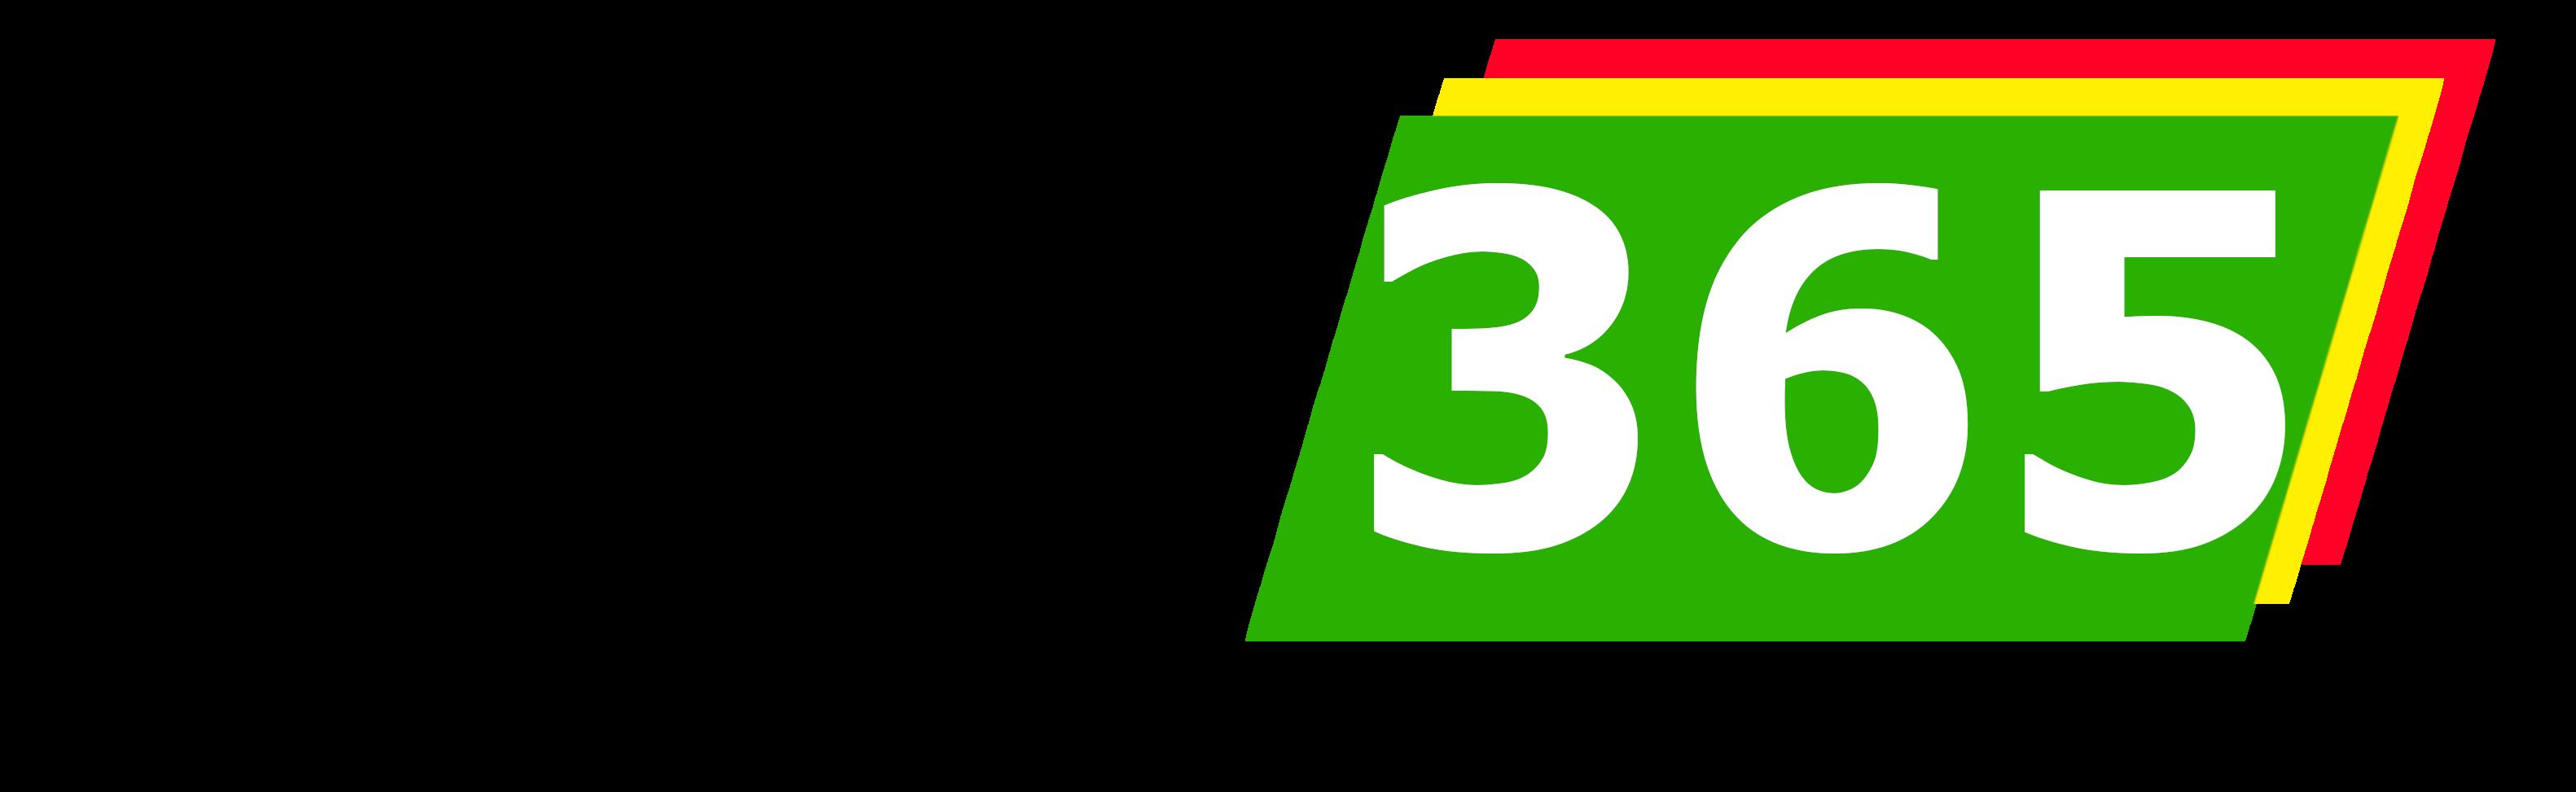 ecoedge3colour6